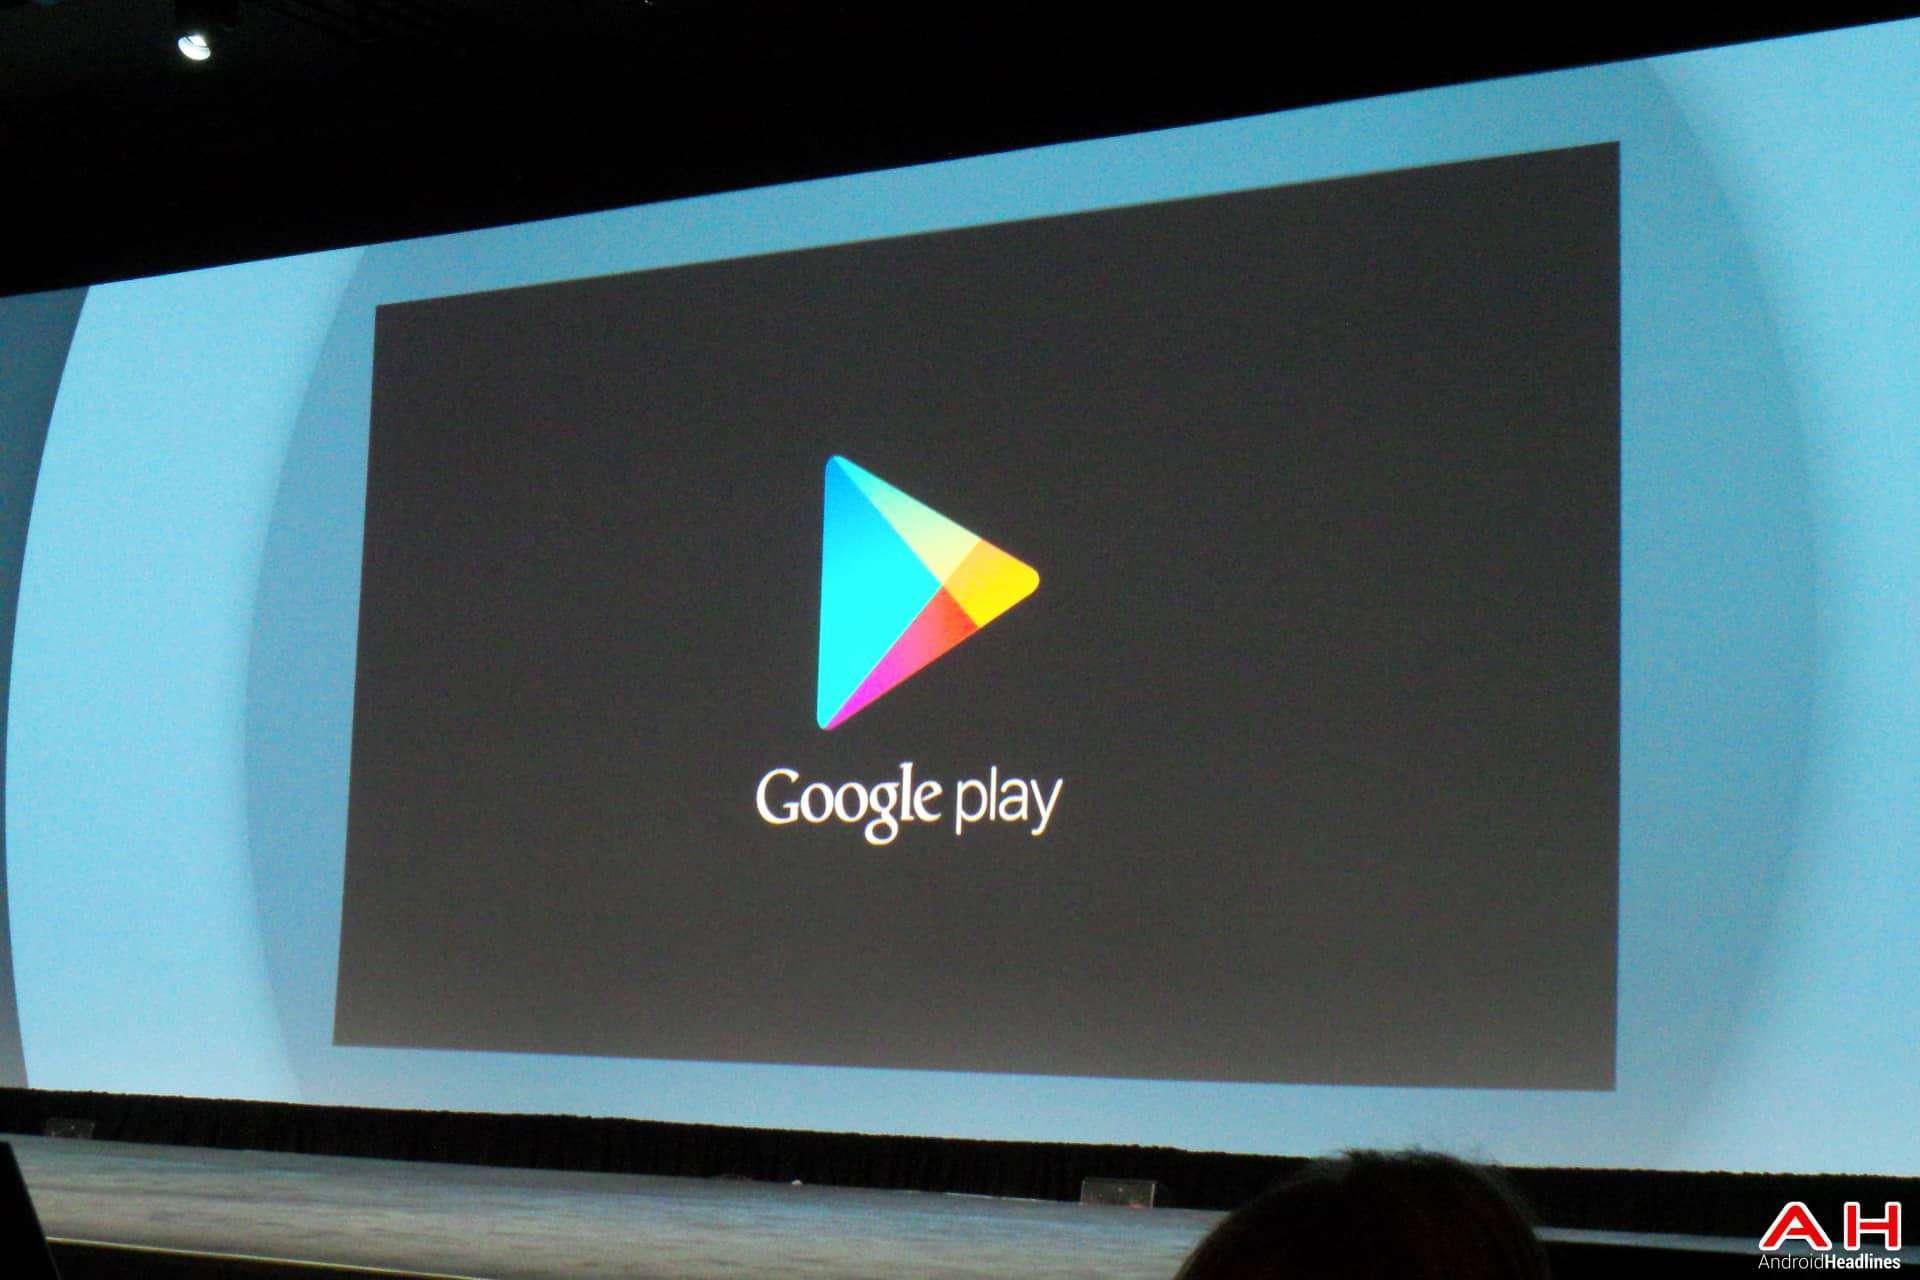 AH Google IO 2014  (3 of 4) Google Play Store 1